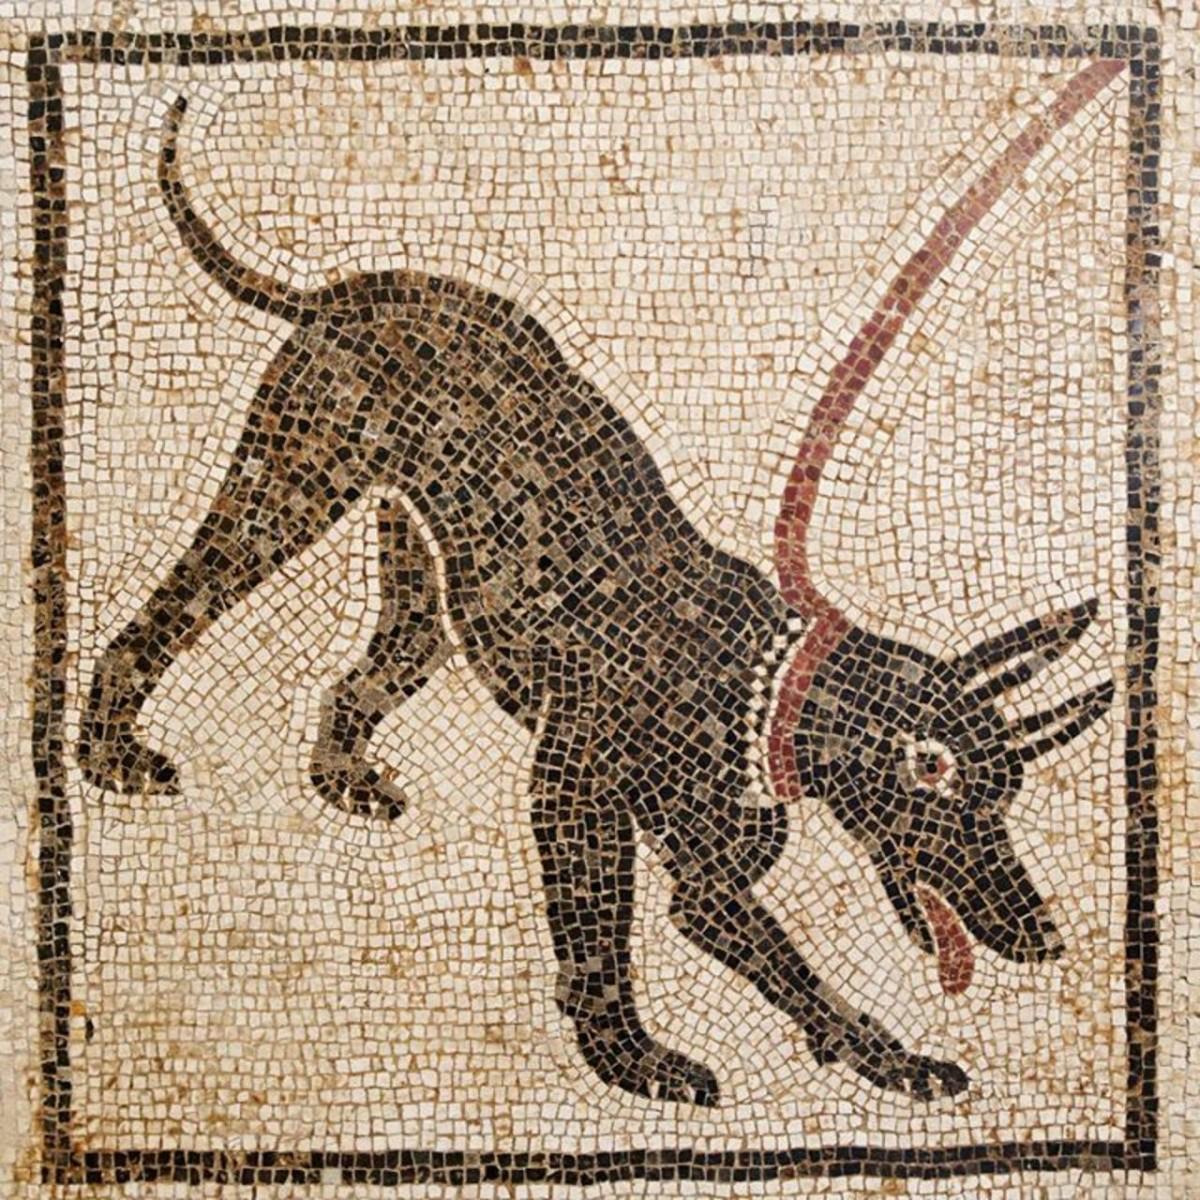 Tấm mosaic tại Pompeii có tên 'Cave Canem' (Beware the dog)  thế kỷ thứ I sau CN